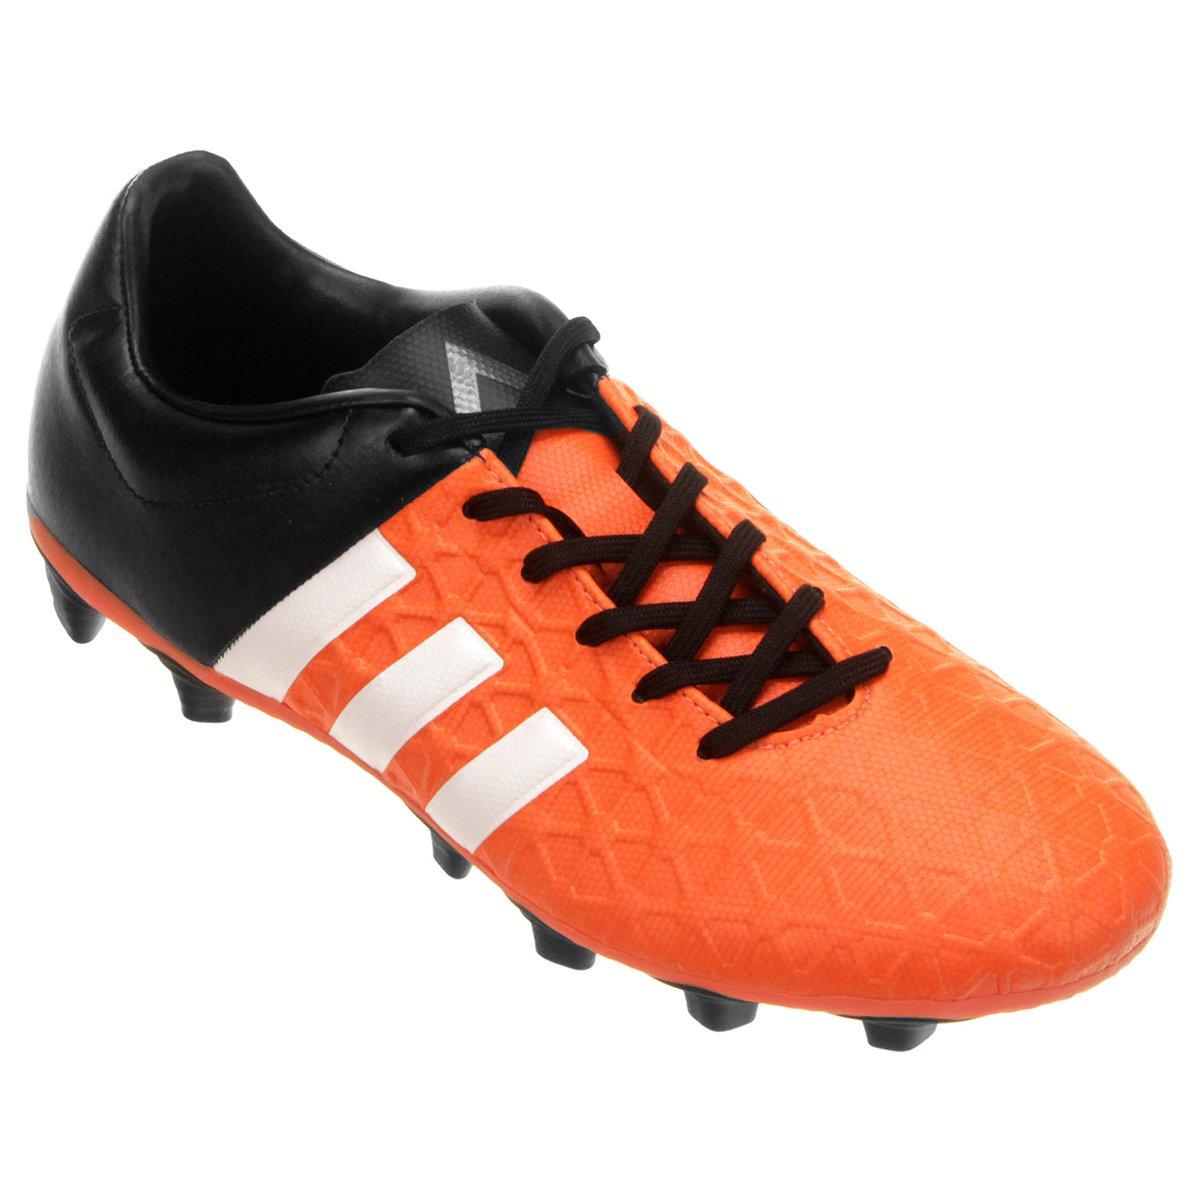 Chuteira Adidas Ace 15.4 FG Campo - Compre Agora  f02debe1f60d8